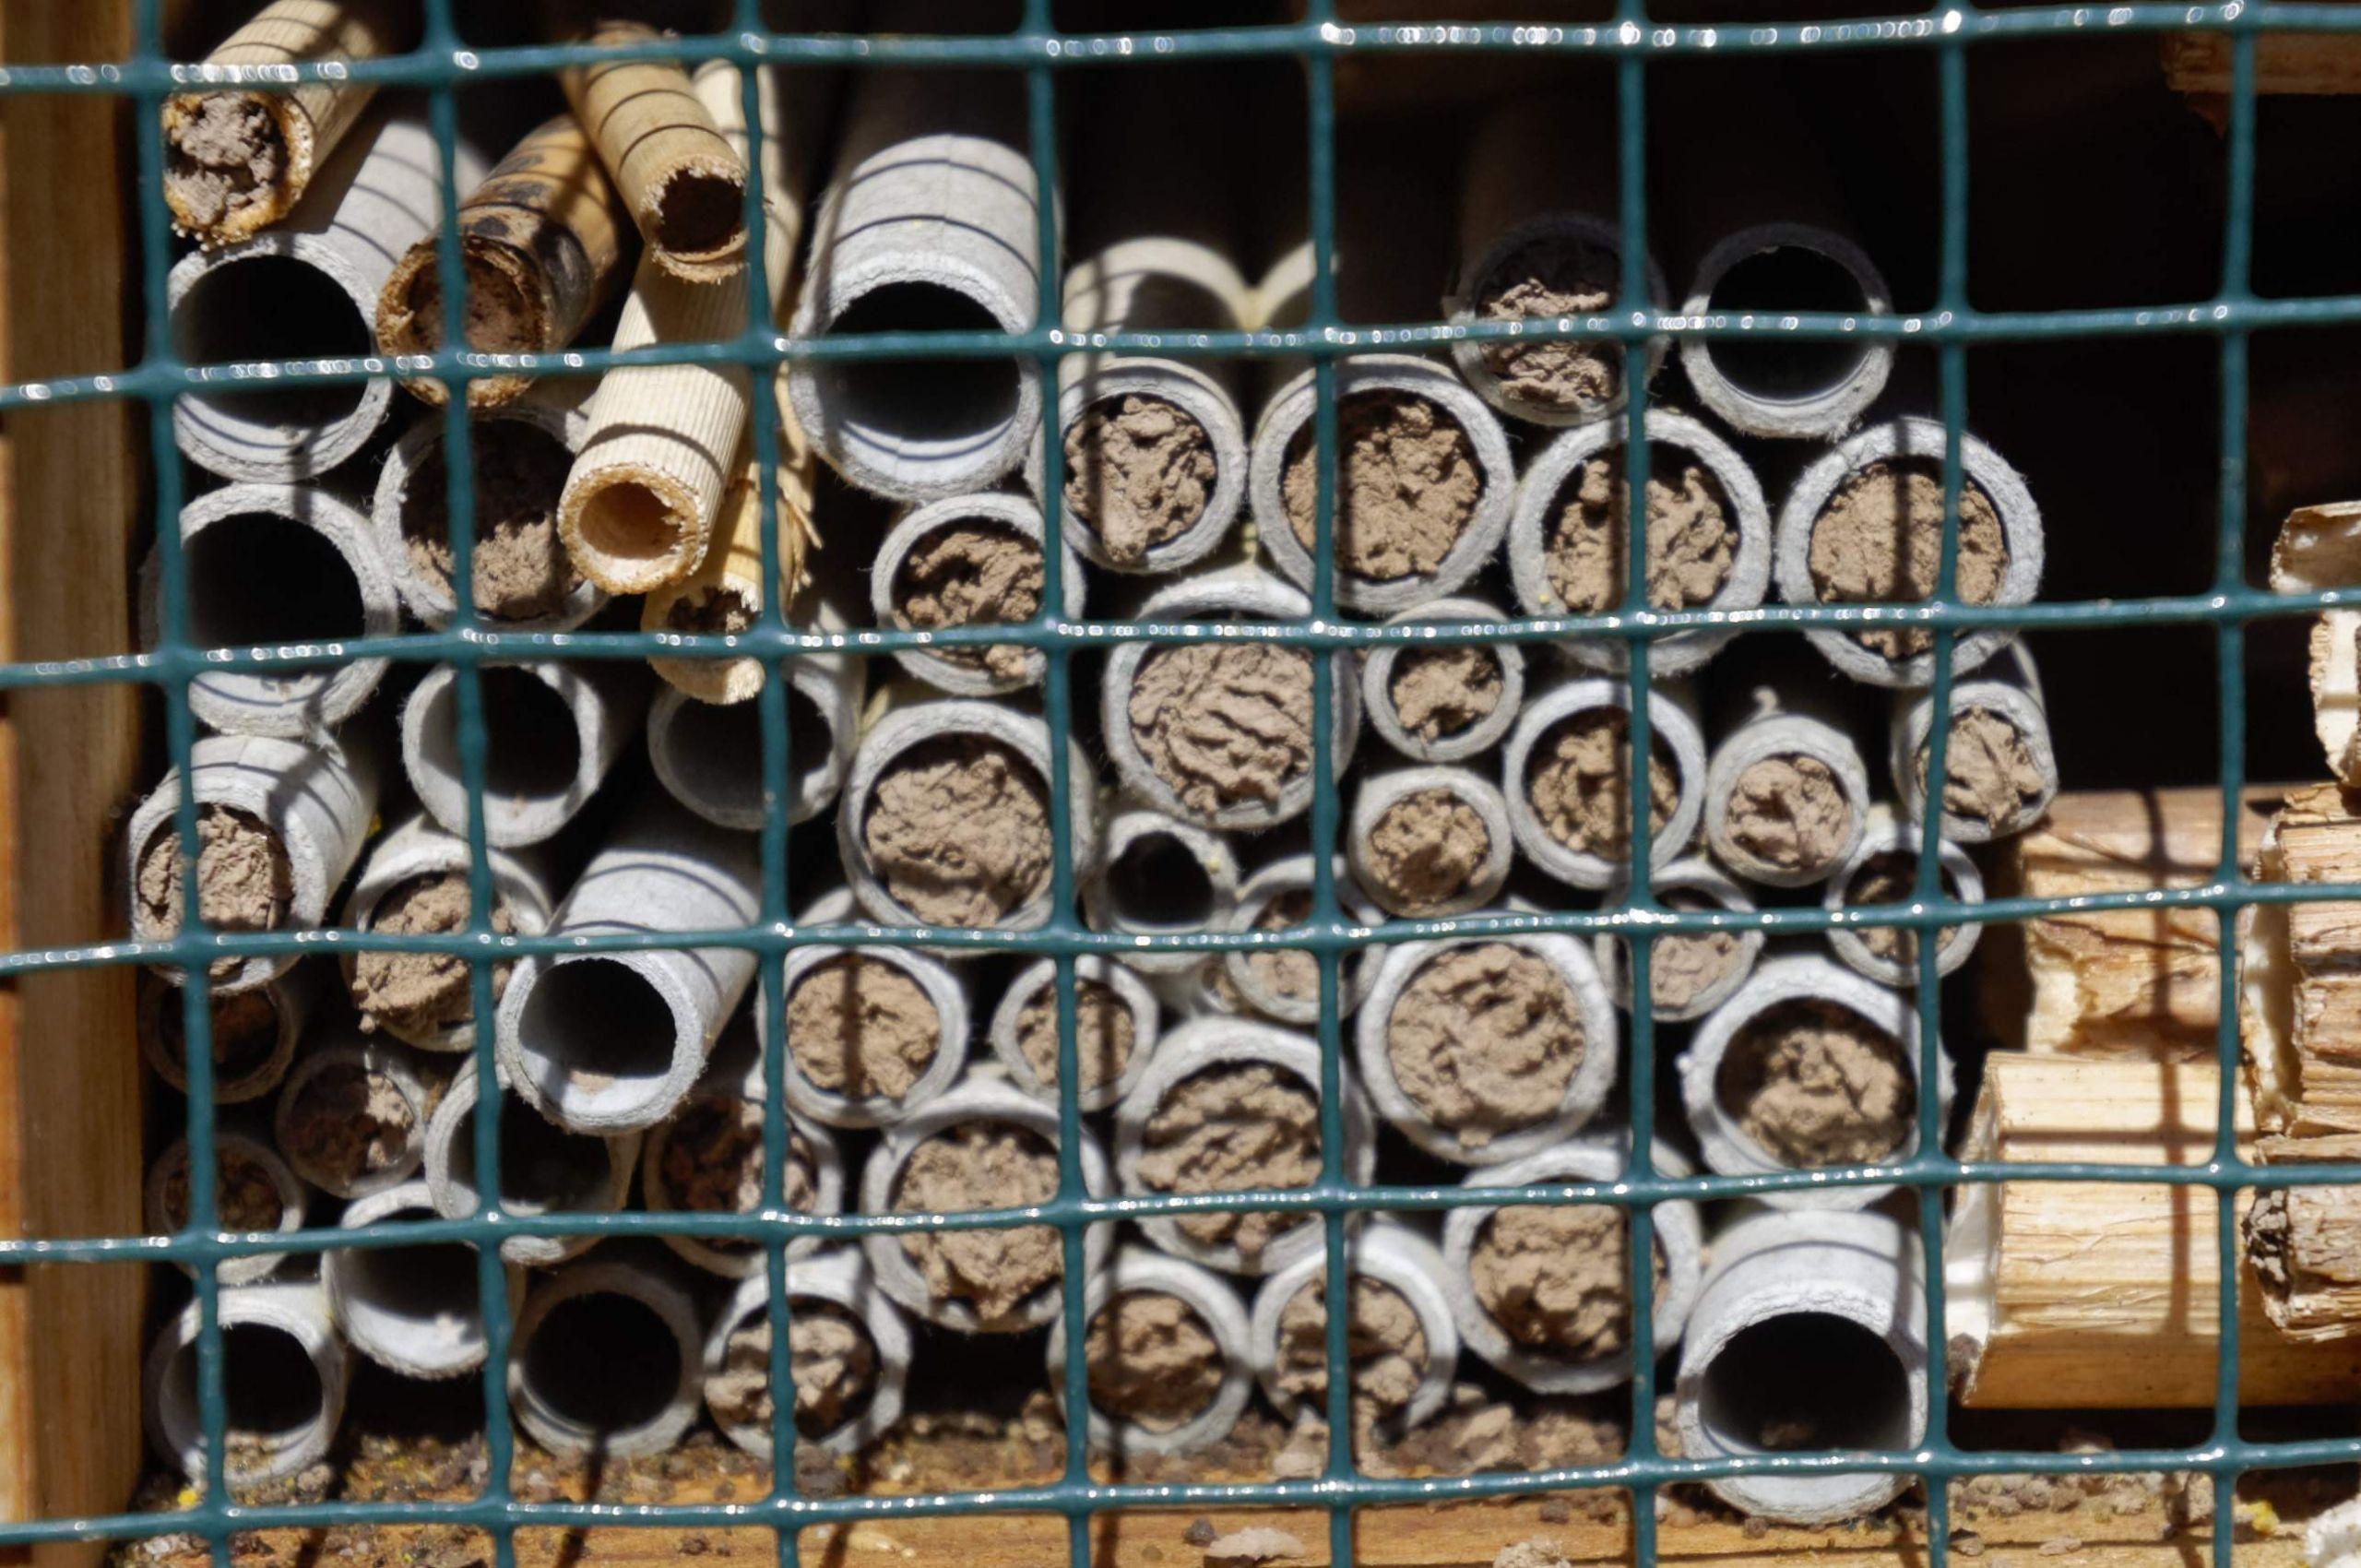 Insektenhotel aus Pappröhrchen 2017 by RaBoe 03